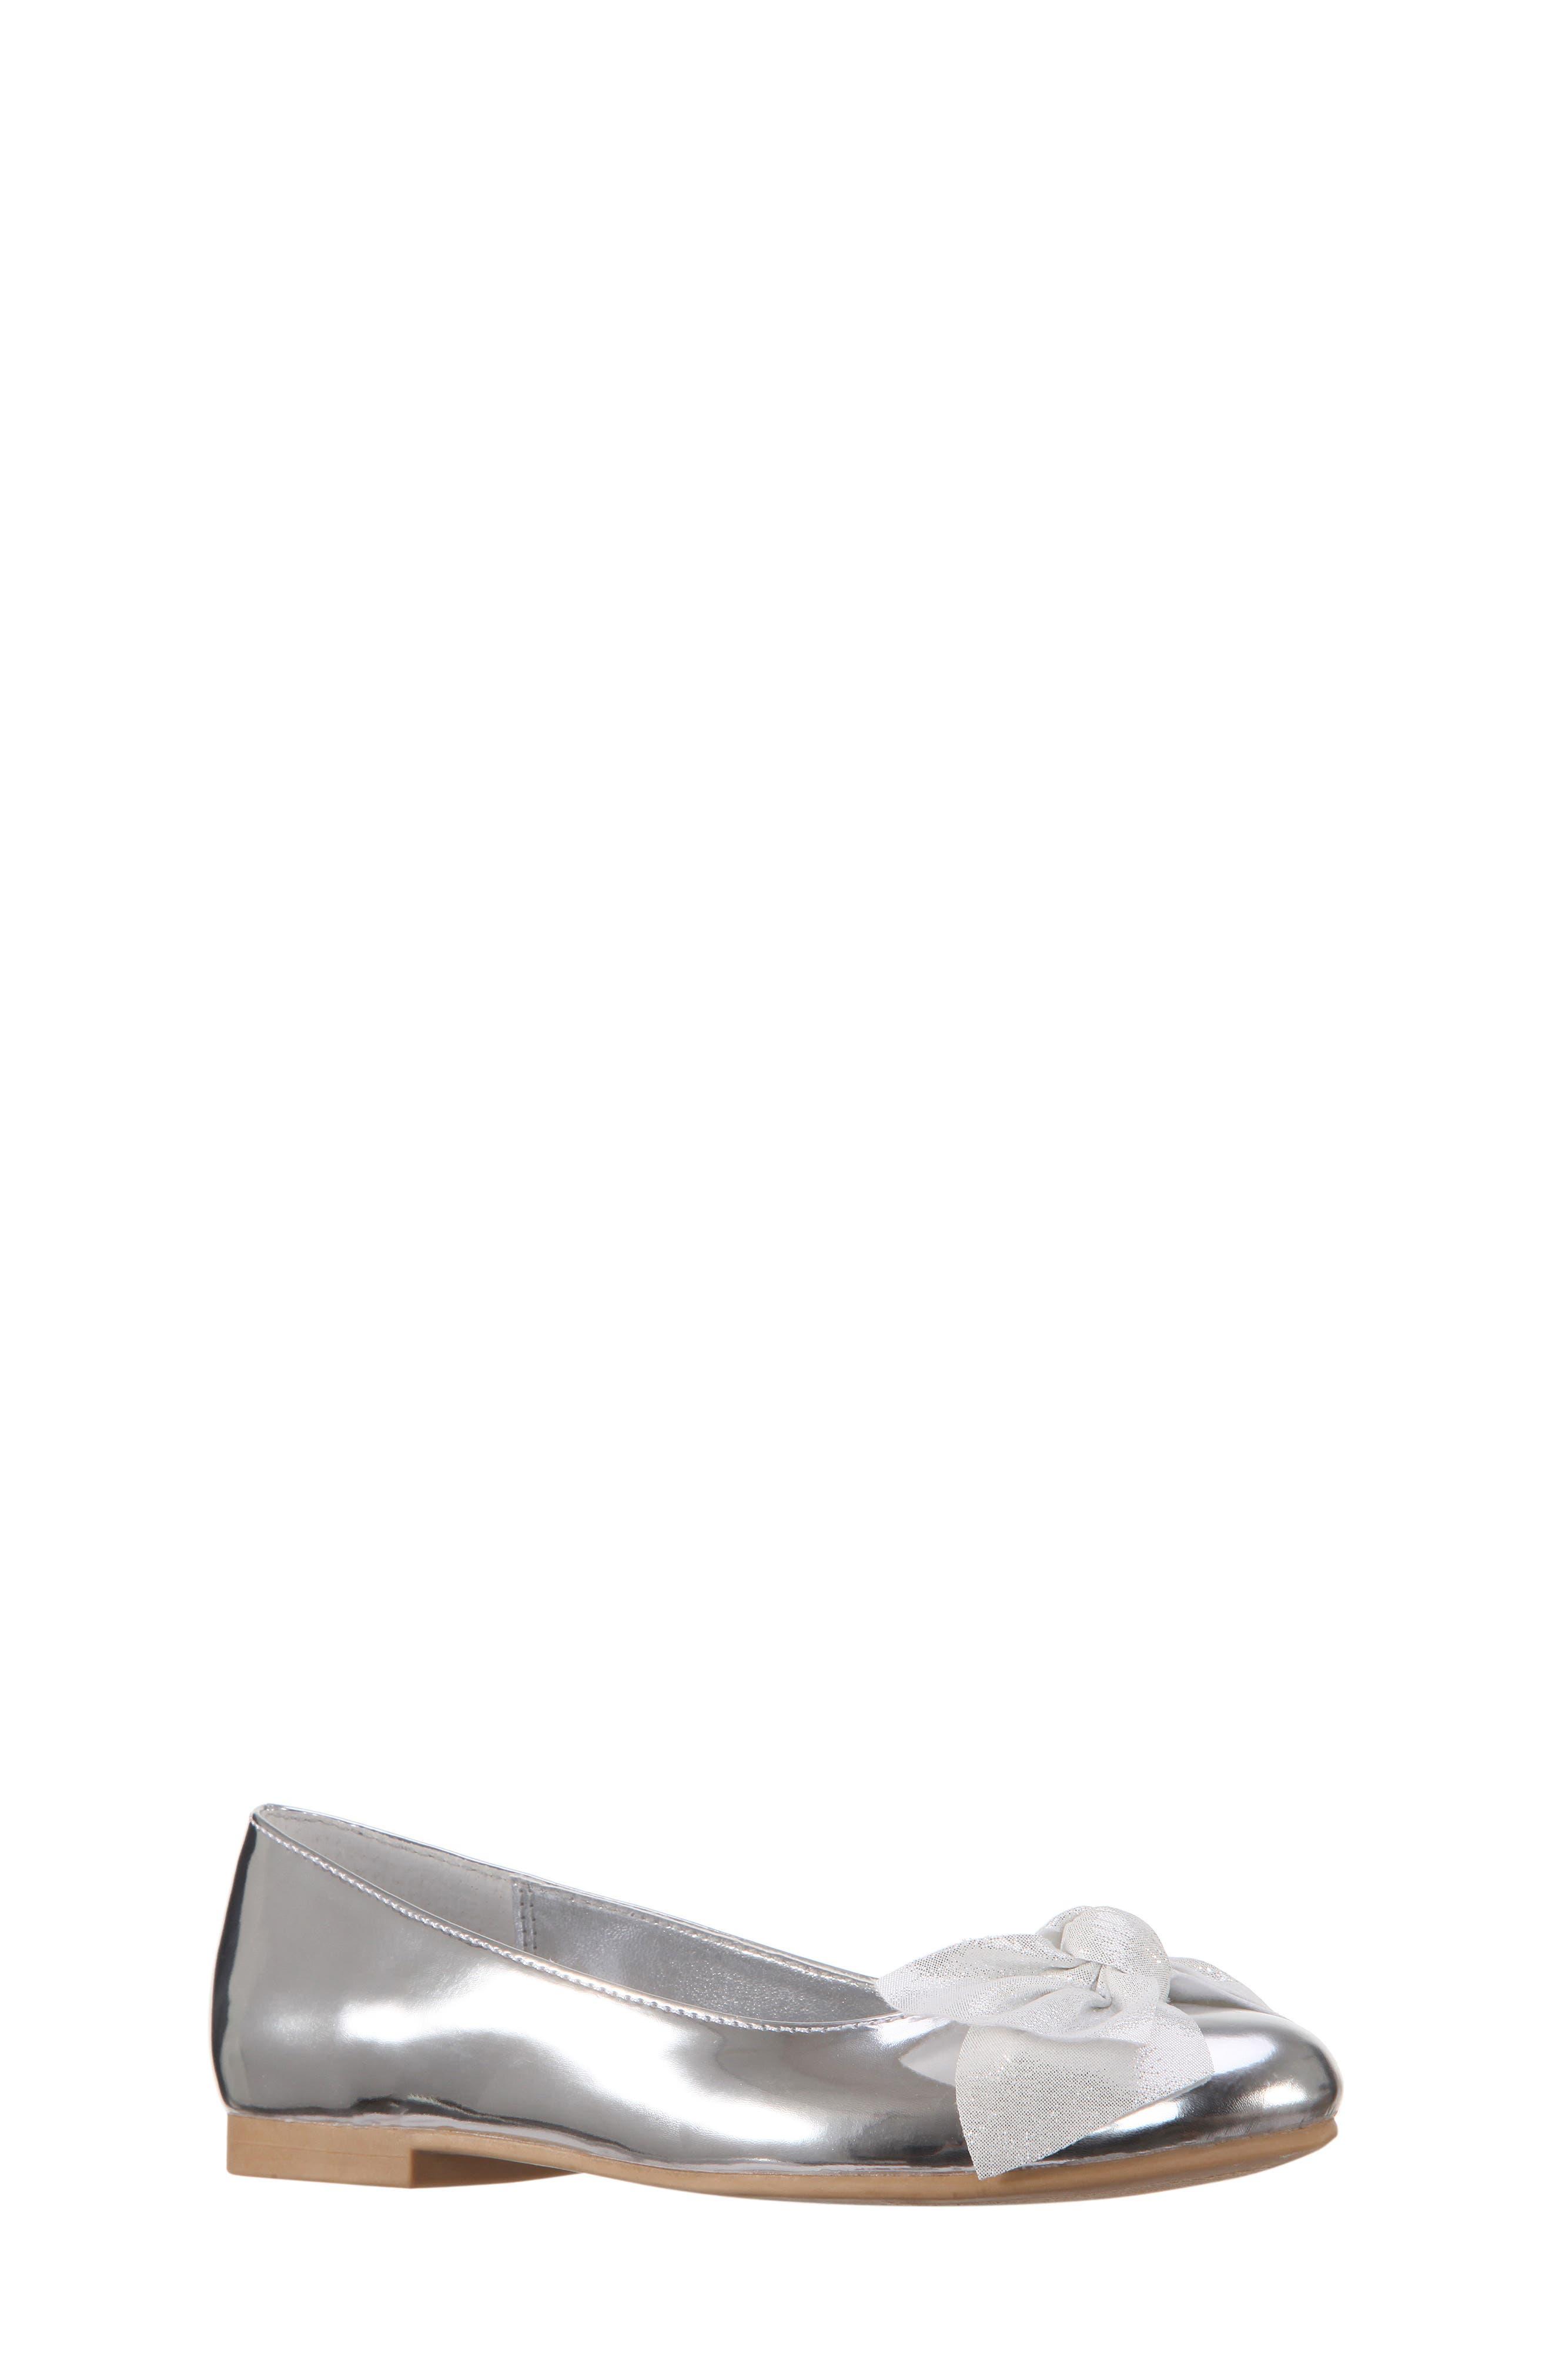 Katelyn Glitter Bow Metallic Ballet Flat,                             Main thumbnail 1, color,                             048